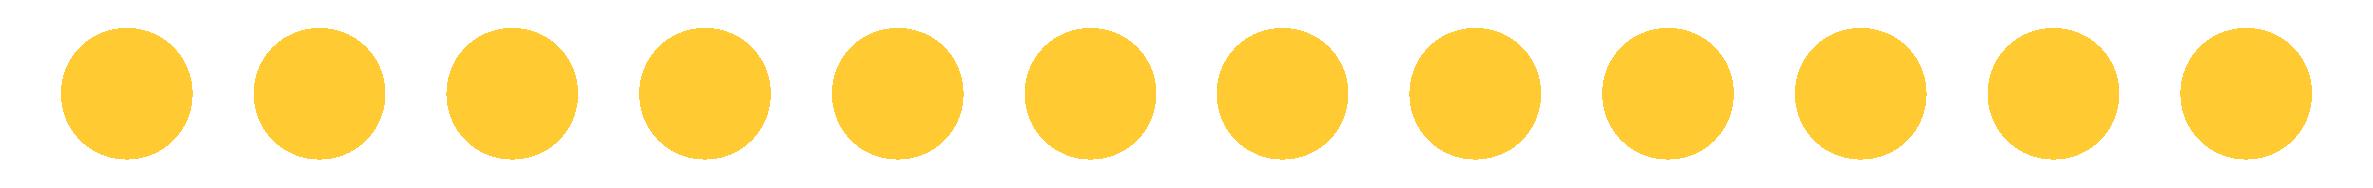 2021-22 CLC Dots_SM_Yellow